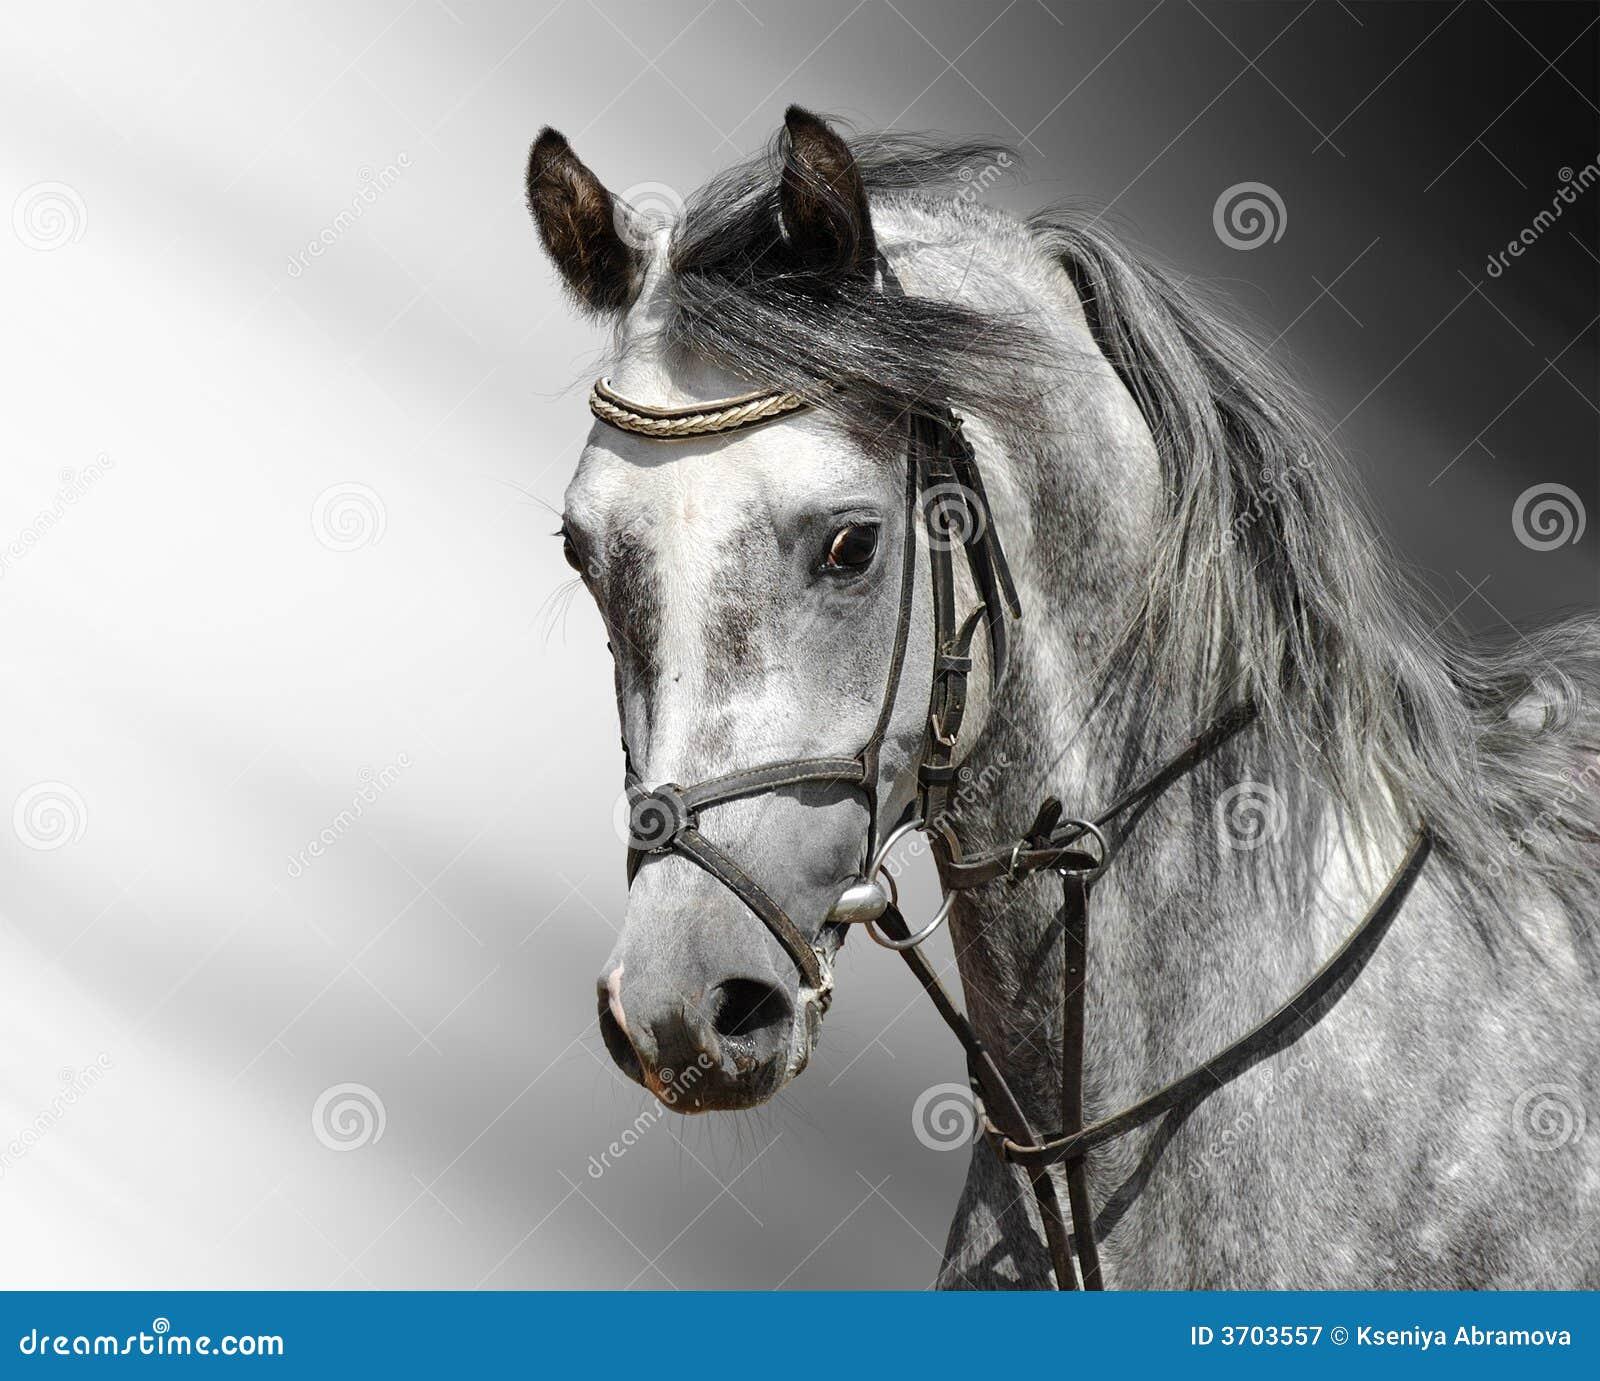 Dapple Grey Horse Arabian Stock Image Image Of Portrait Bridoon 3703557